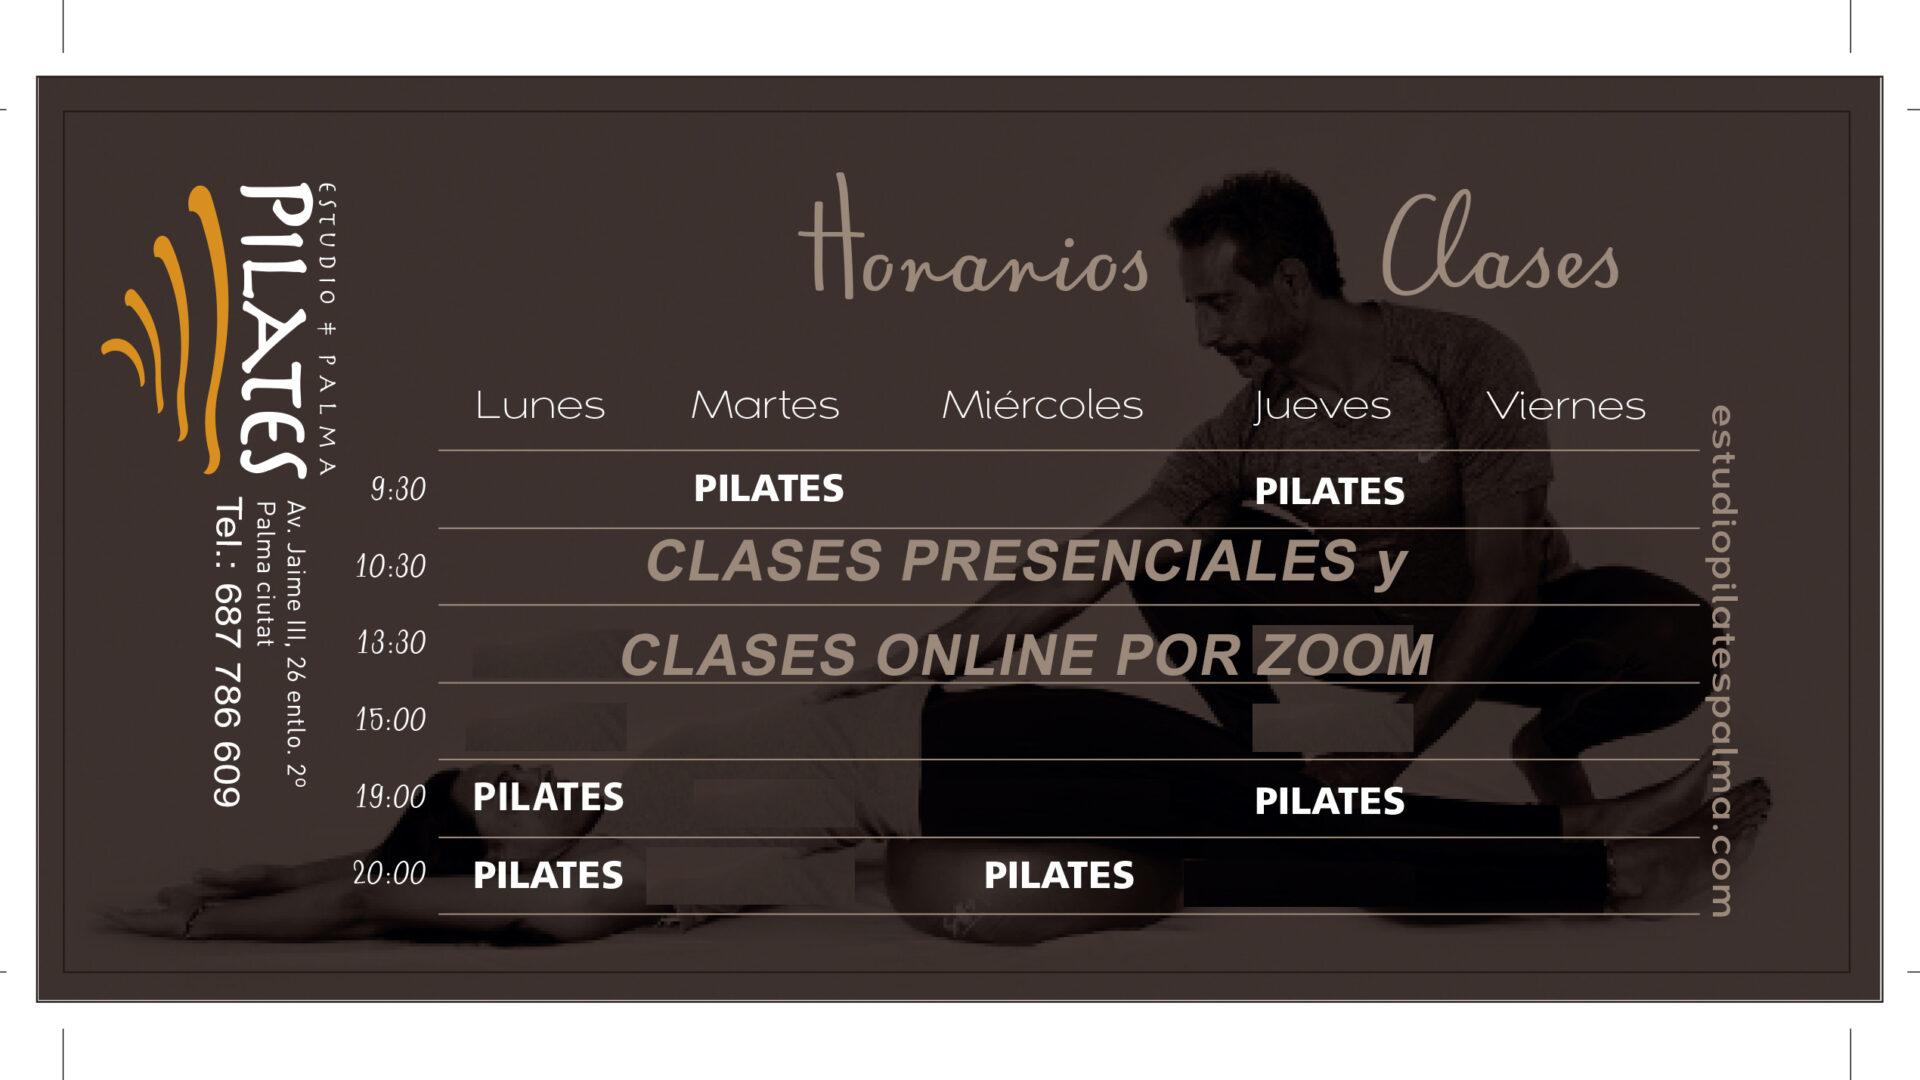 Horarios Pilates